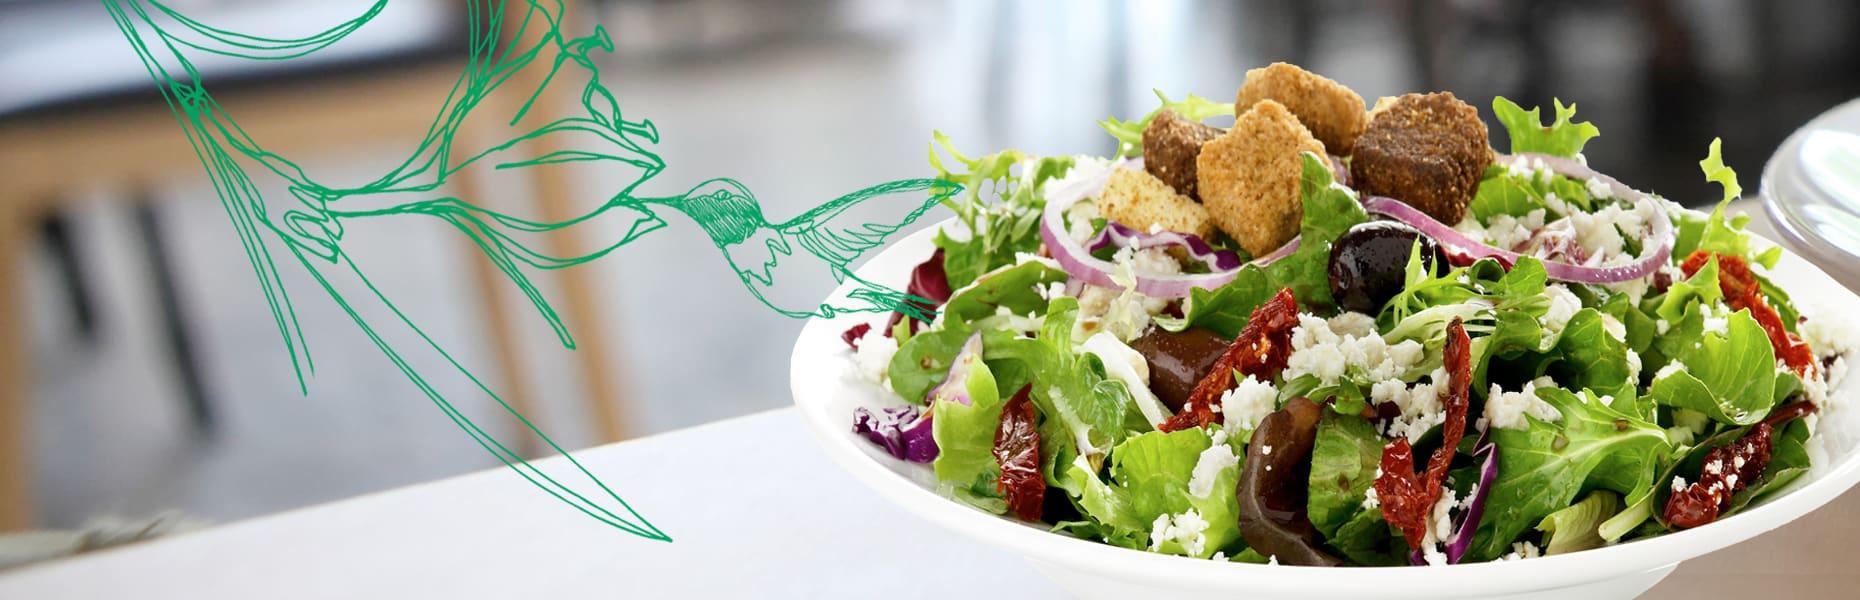 EVOS hjand Tossed Salads